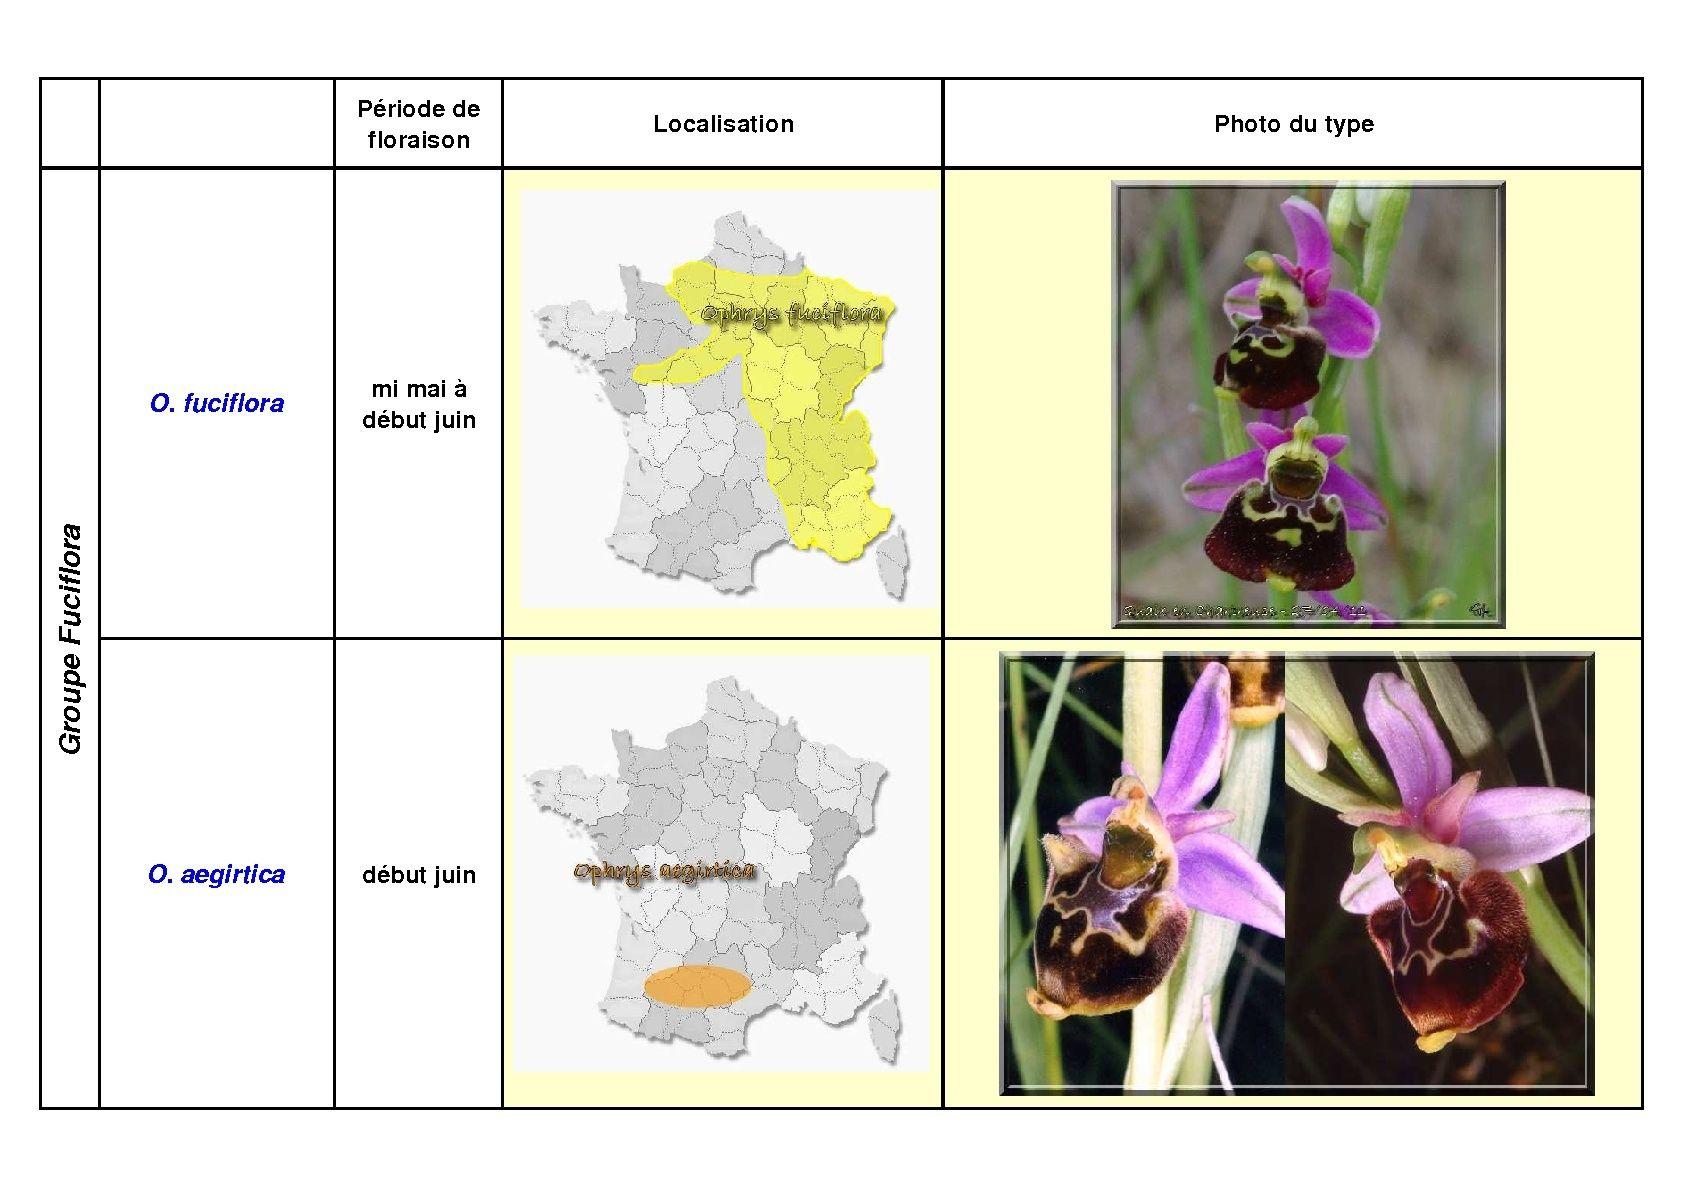 Le complexe fuciflora du Sud Est... simplifié Fucifl18